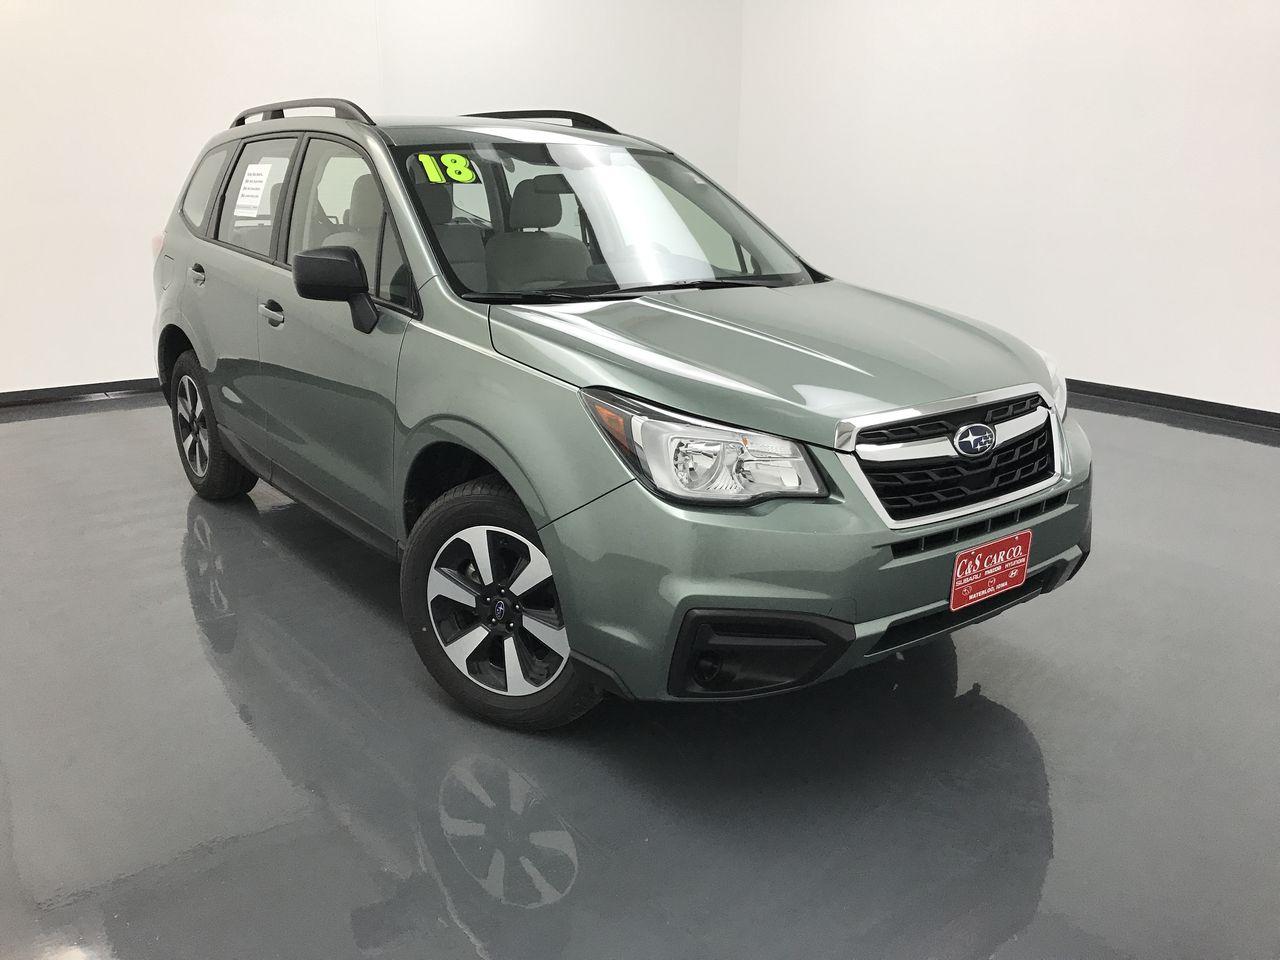 2018 Subaru Forester  - C & S Car Company